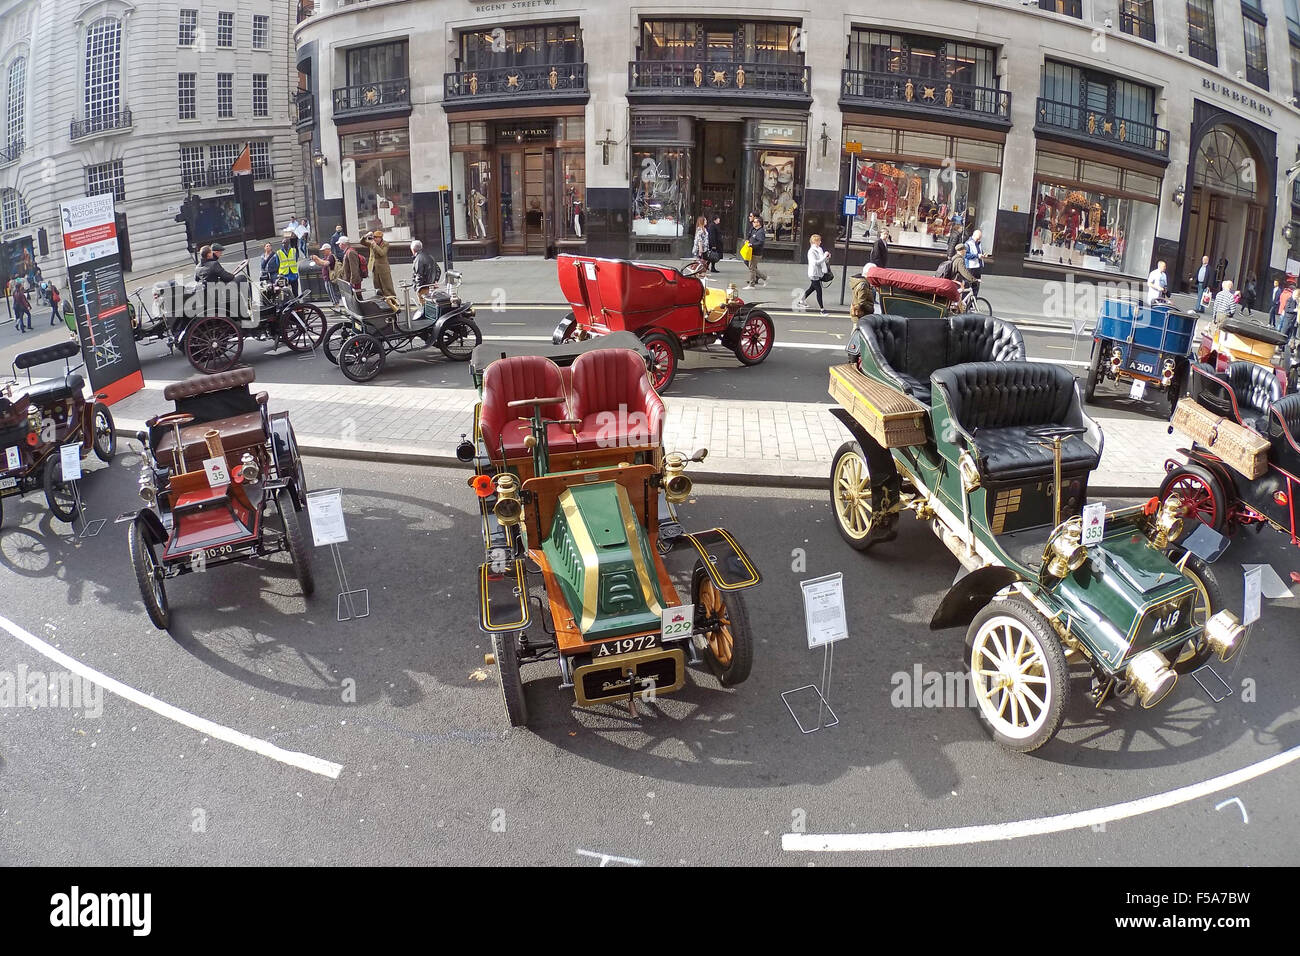 London, UK. 31st October 2015. Veteran Cars at the Regent Street ...